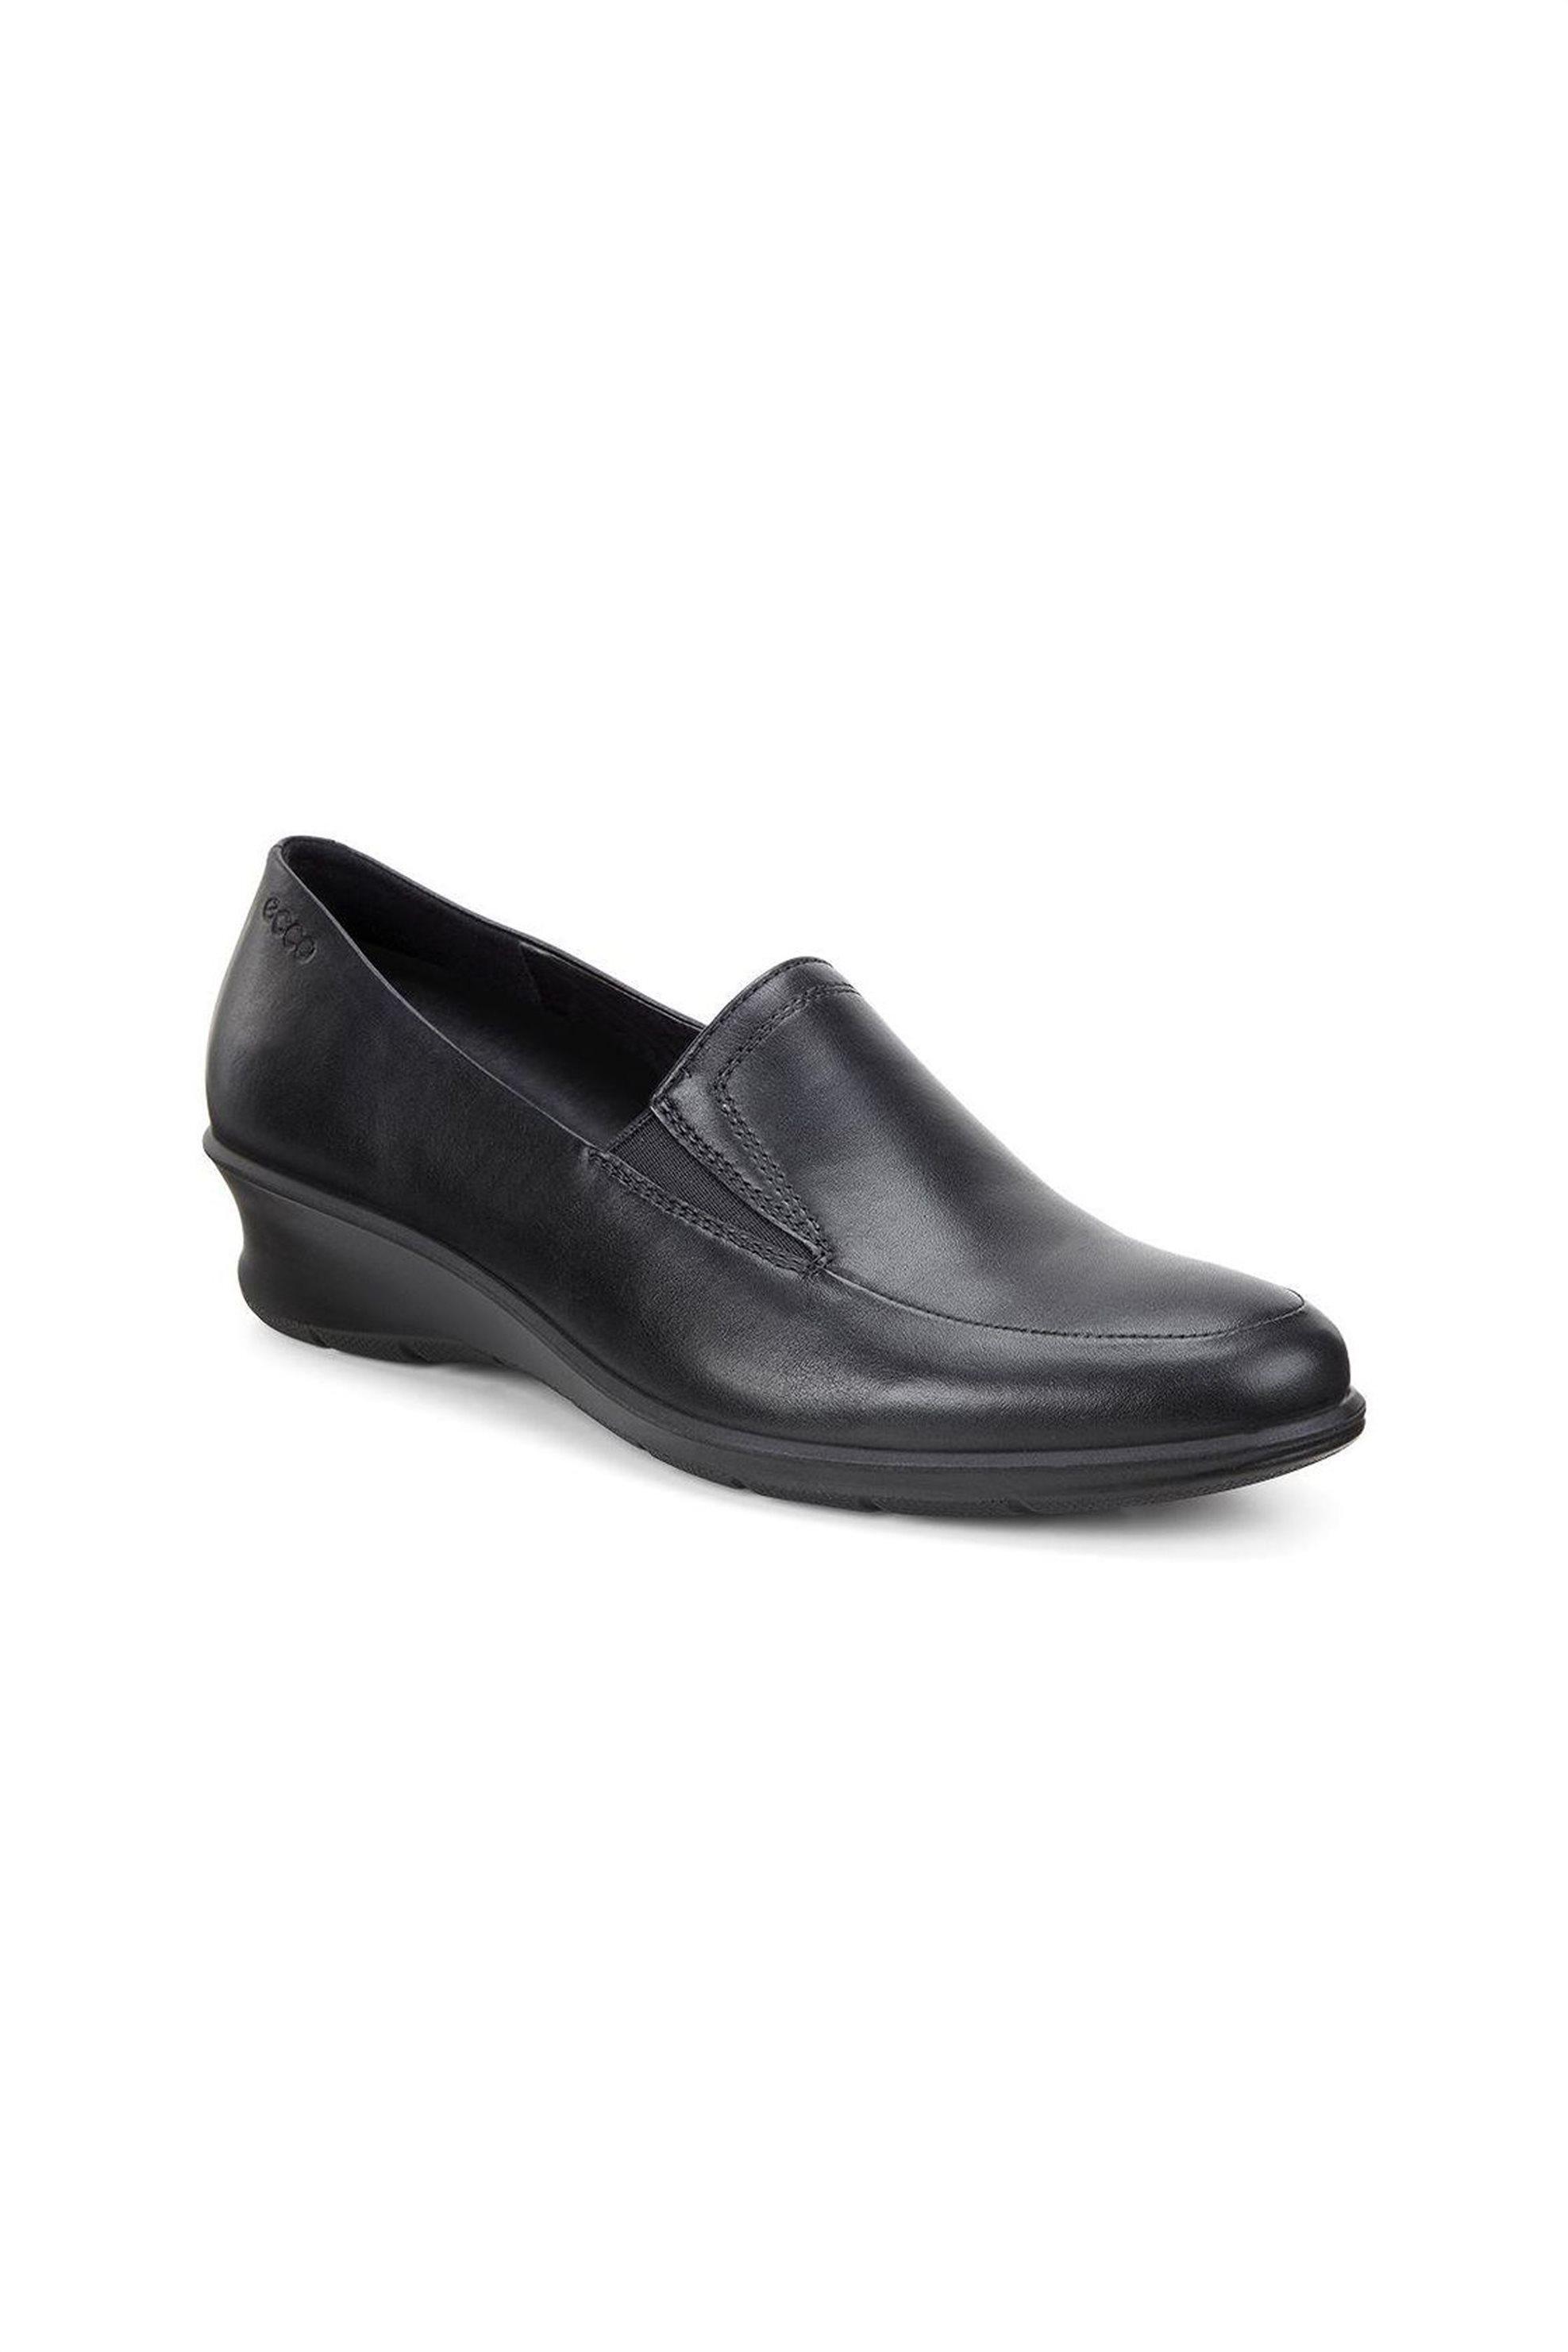 ECCO γυναικεία παπούτσια Felicia – 217053 – Γκρι